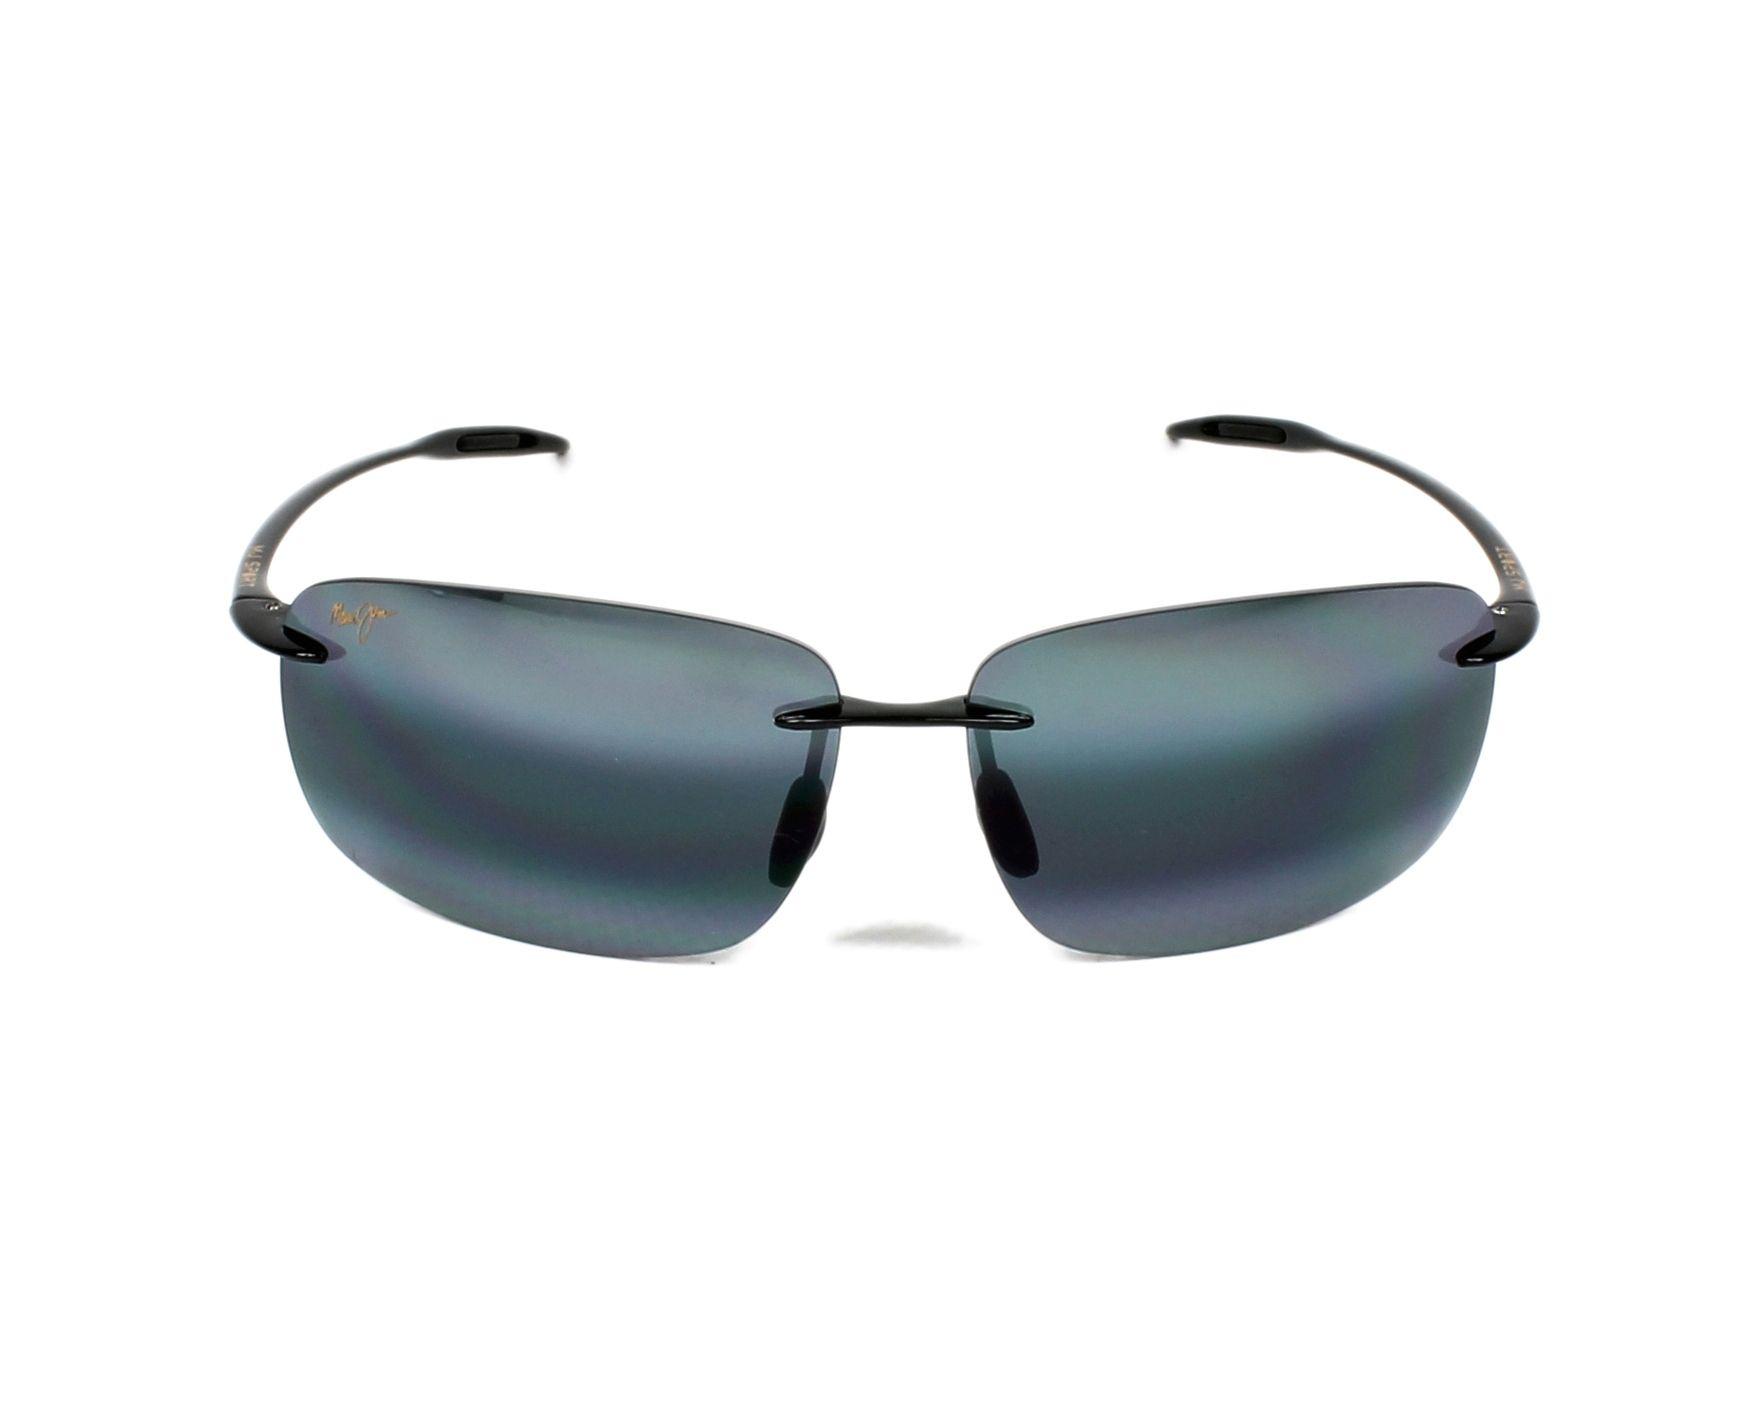 64e1f7a72674 Sunglasses Maui Jim 422 02 63-13 Black front view